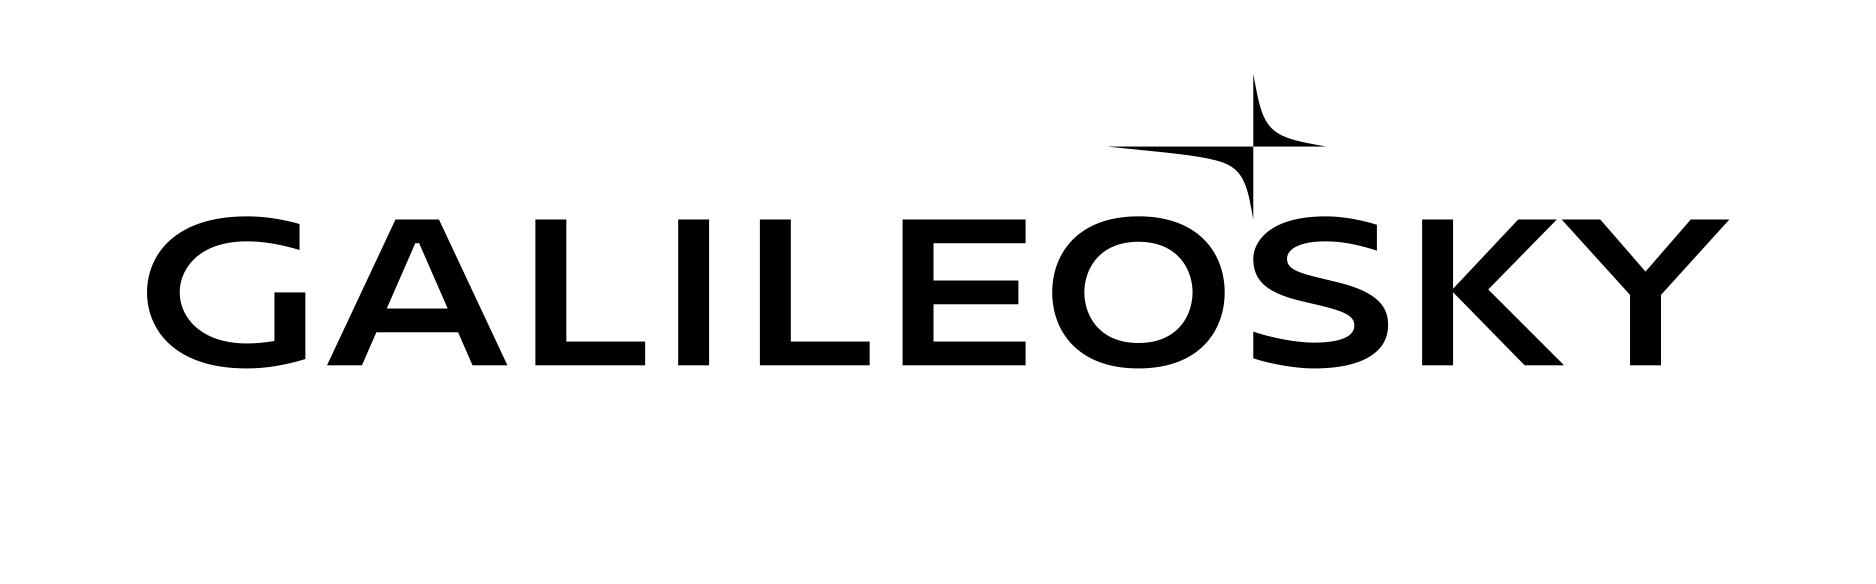 Galileosky Innovation in motion